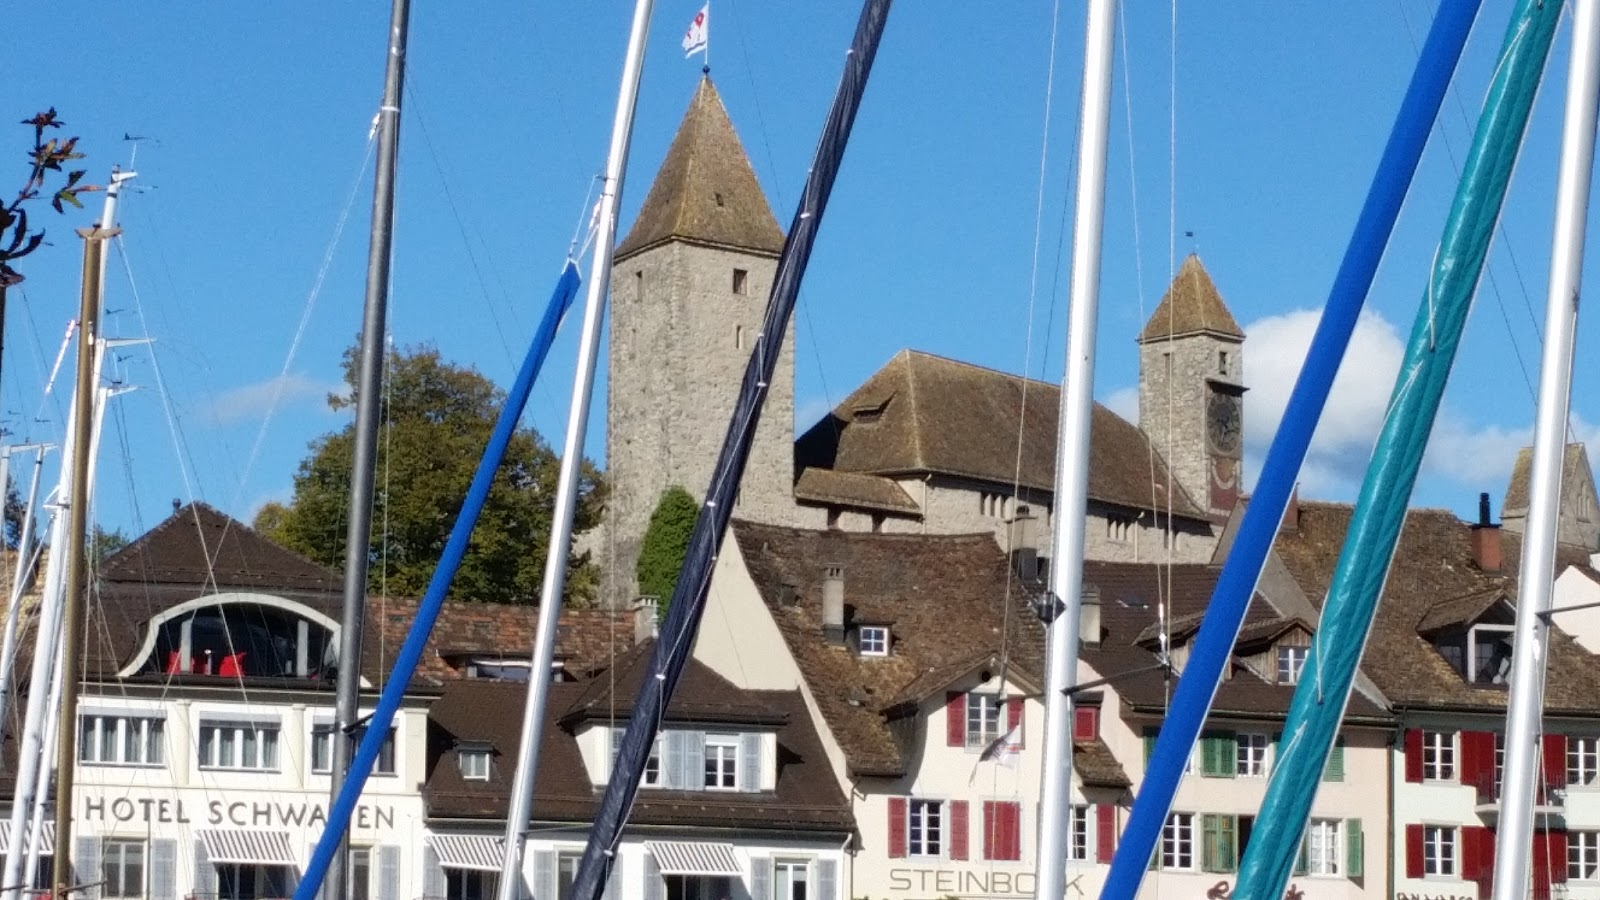 Rapperswil - Jona, Switzerland